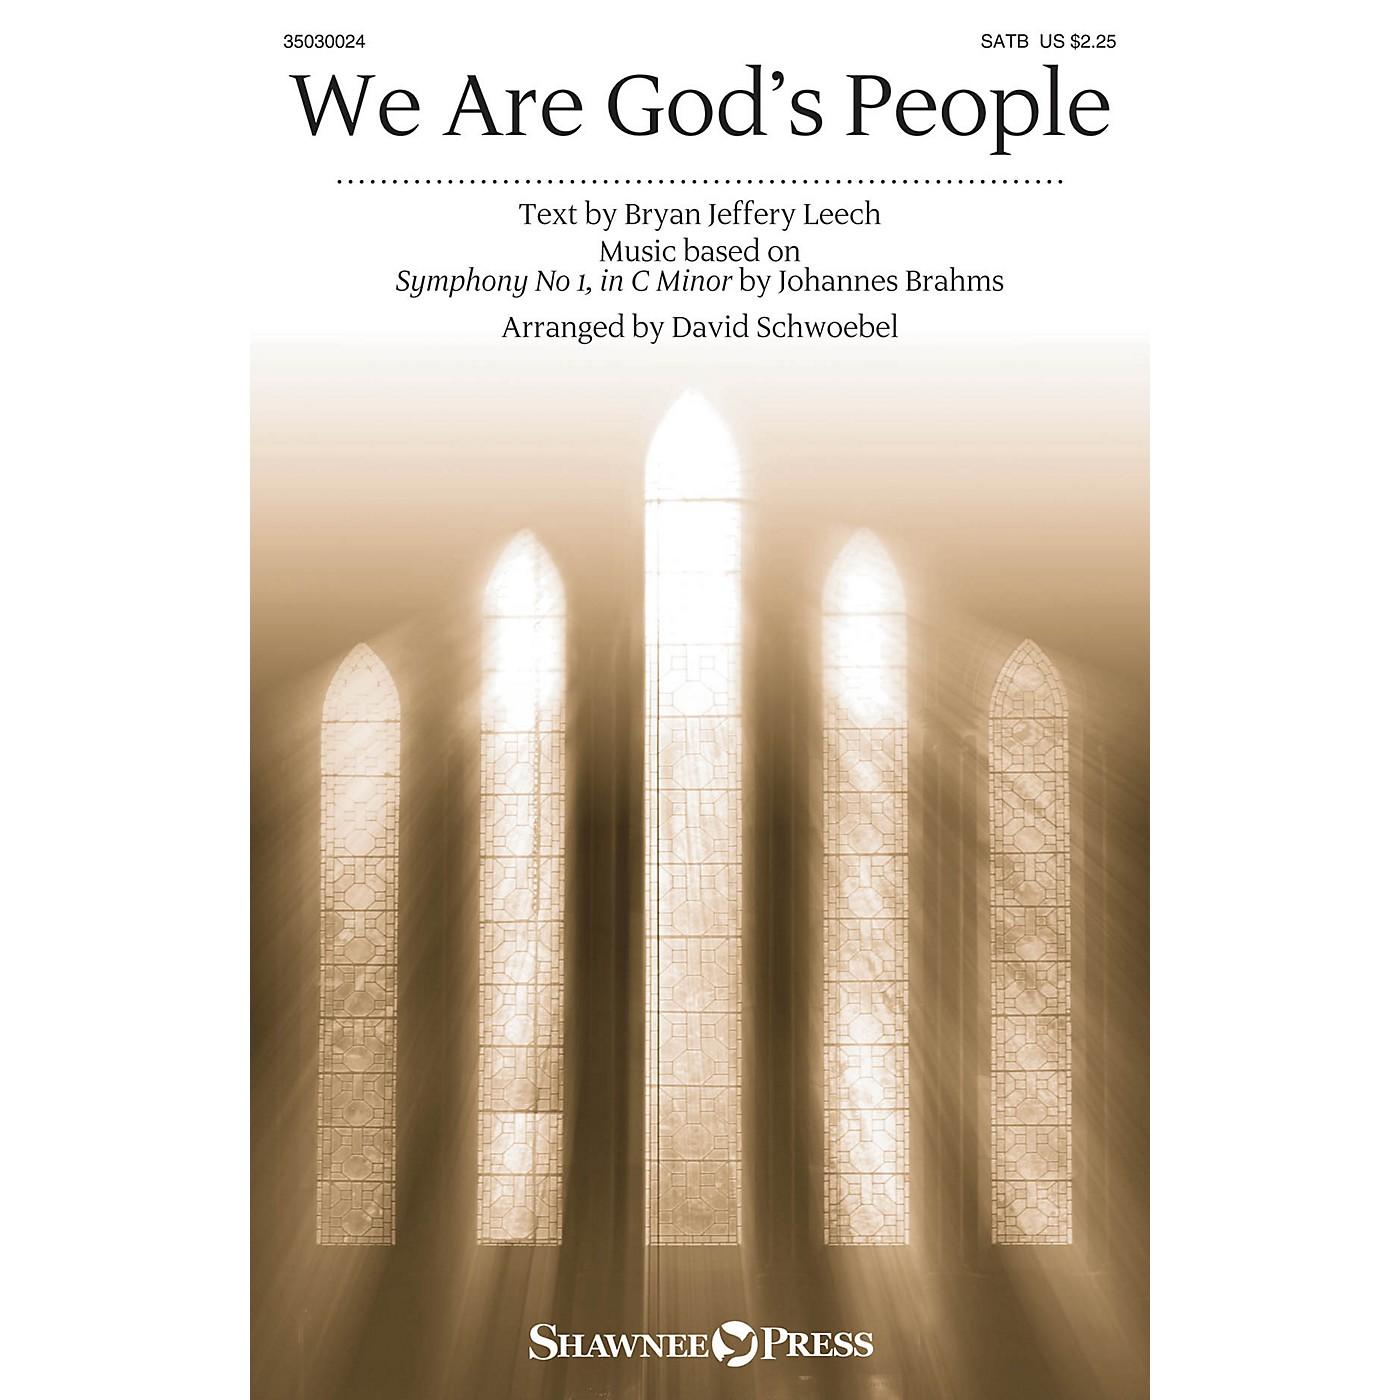 Shawnee Press We Are God's People SATB arranged by David Schwoebel thumbnail